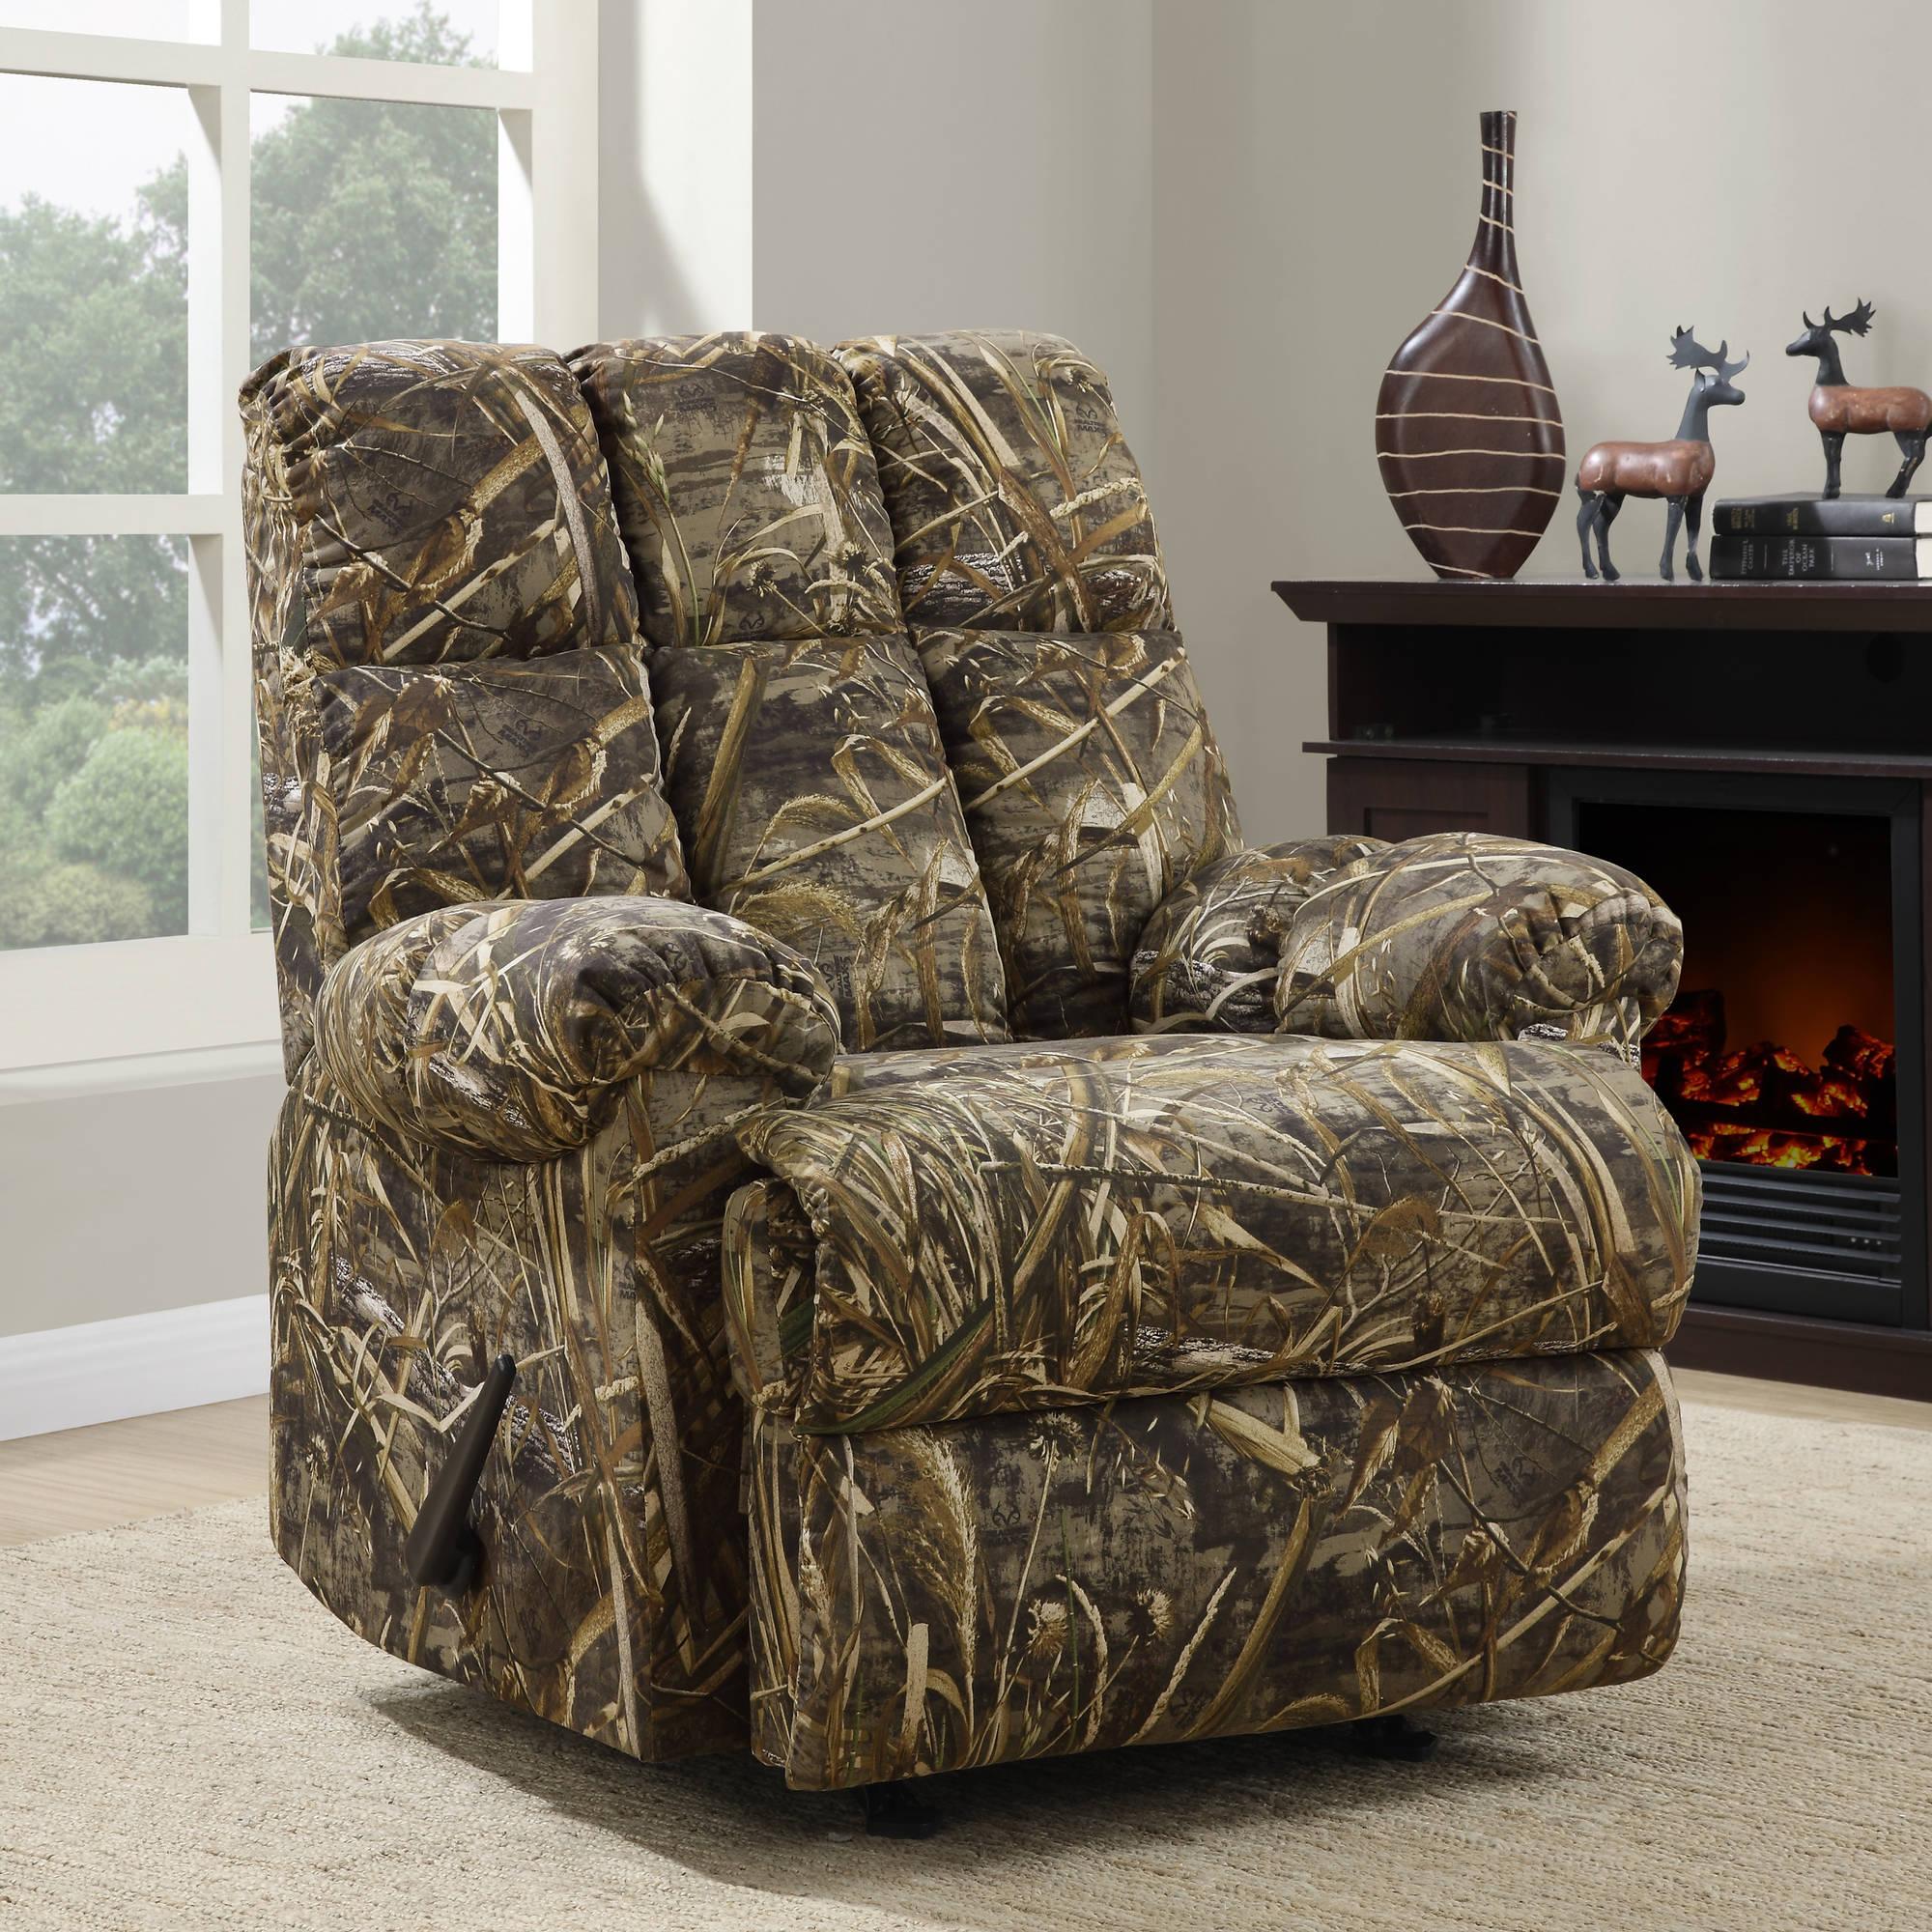 Dorel Living Realtree Camouflage Rocker Recliner - Walmart.Com